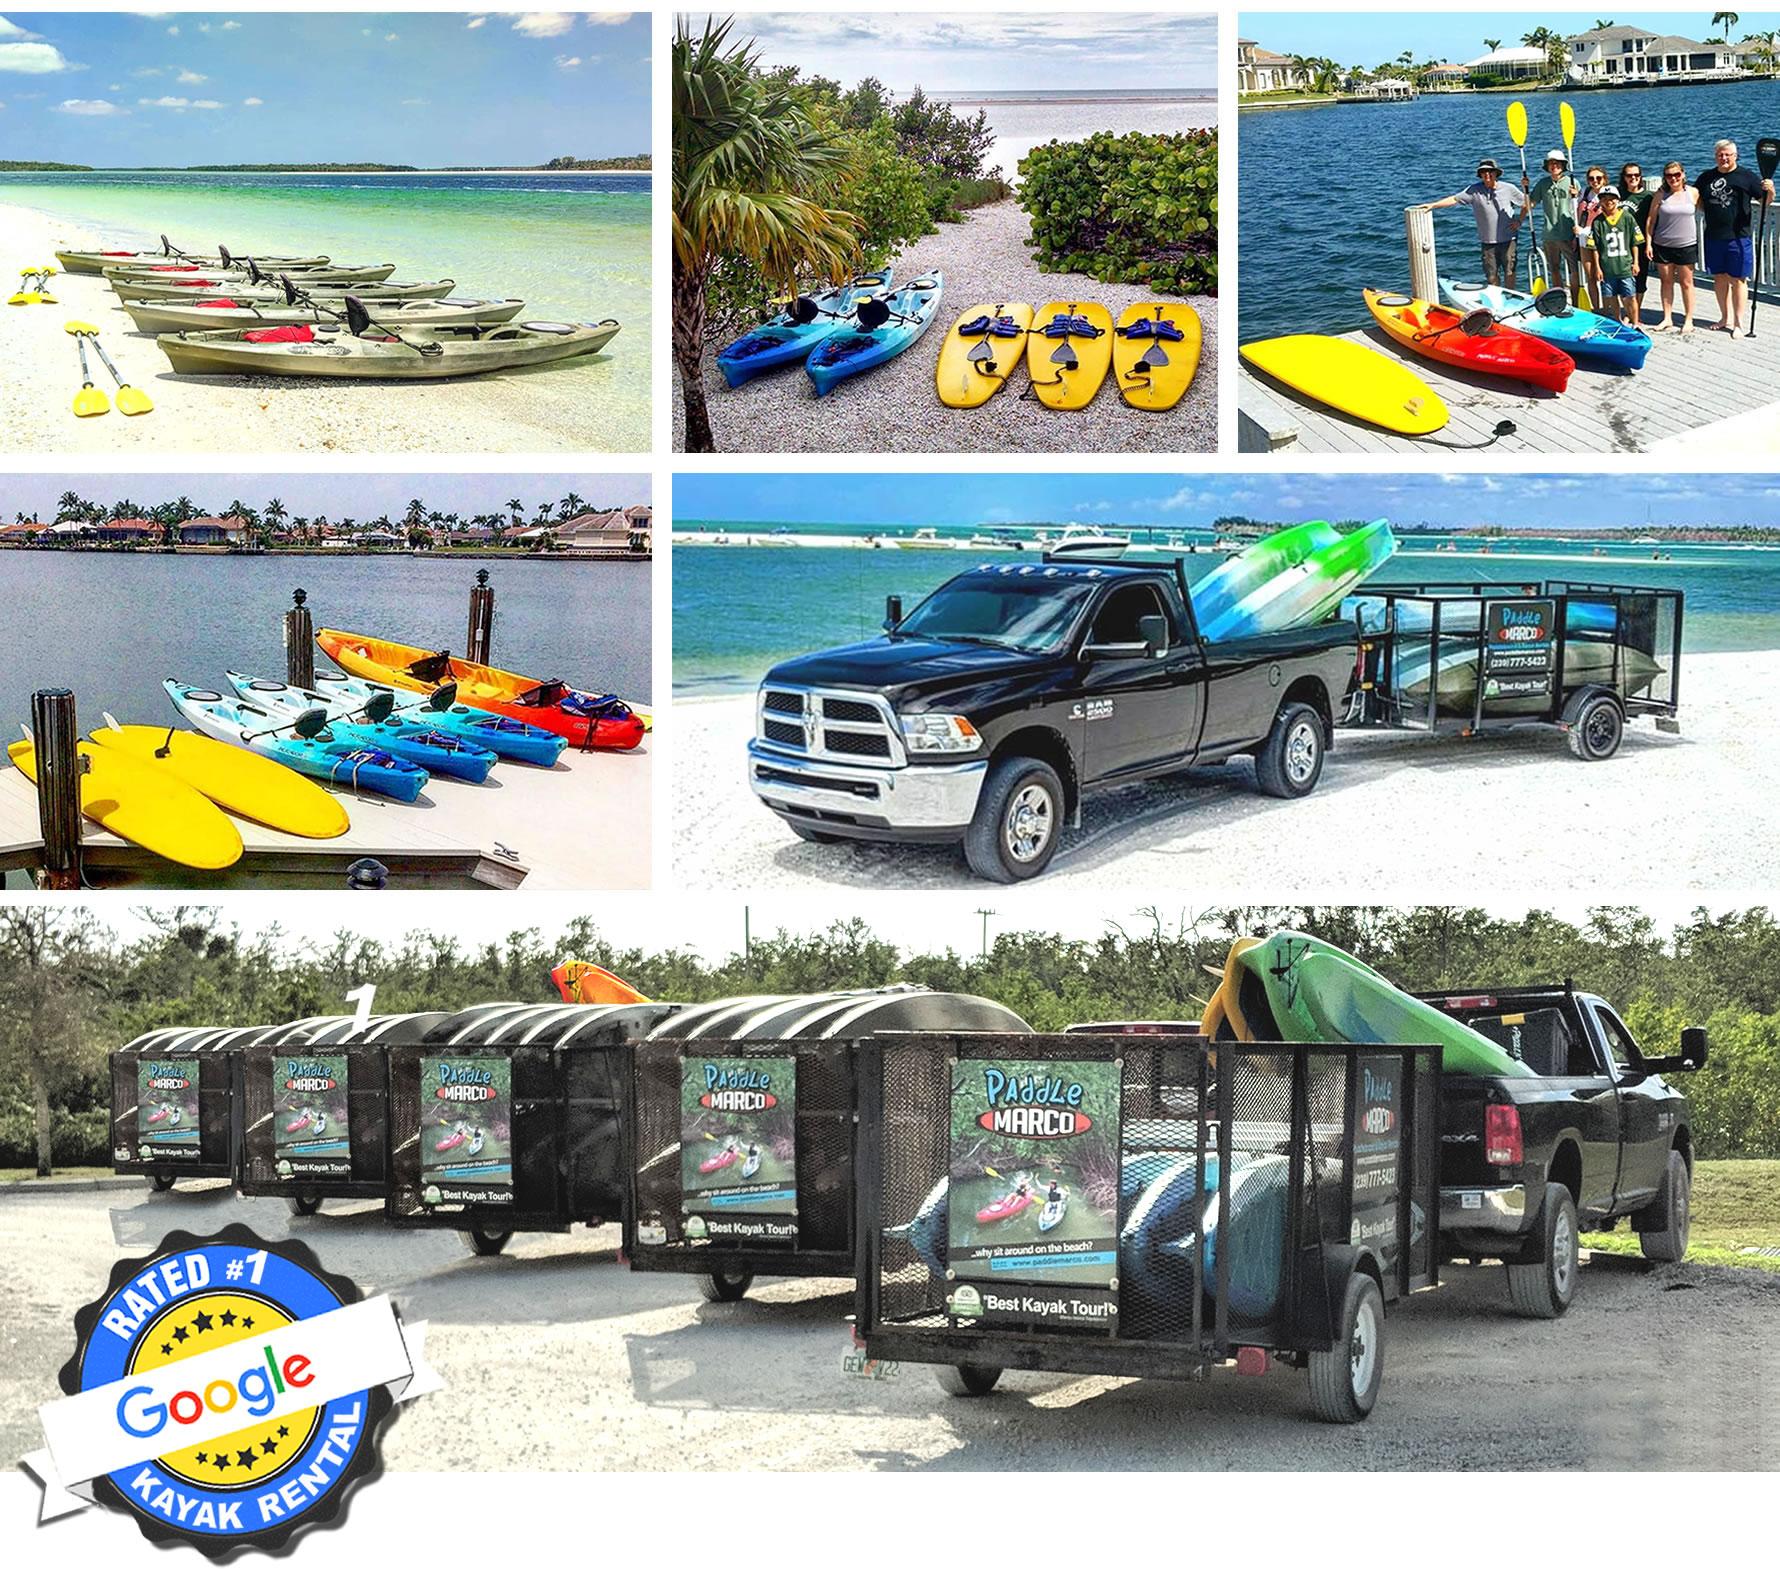 Marco Island Kayak Rental